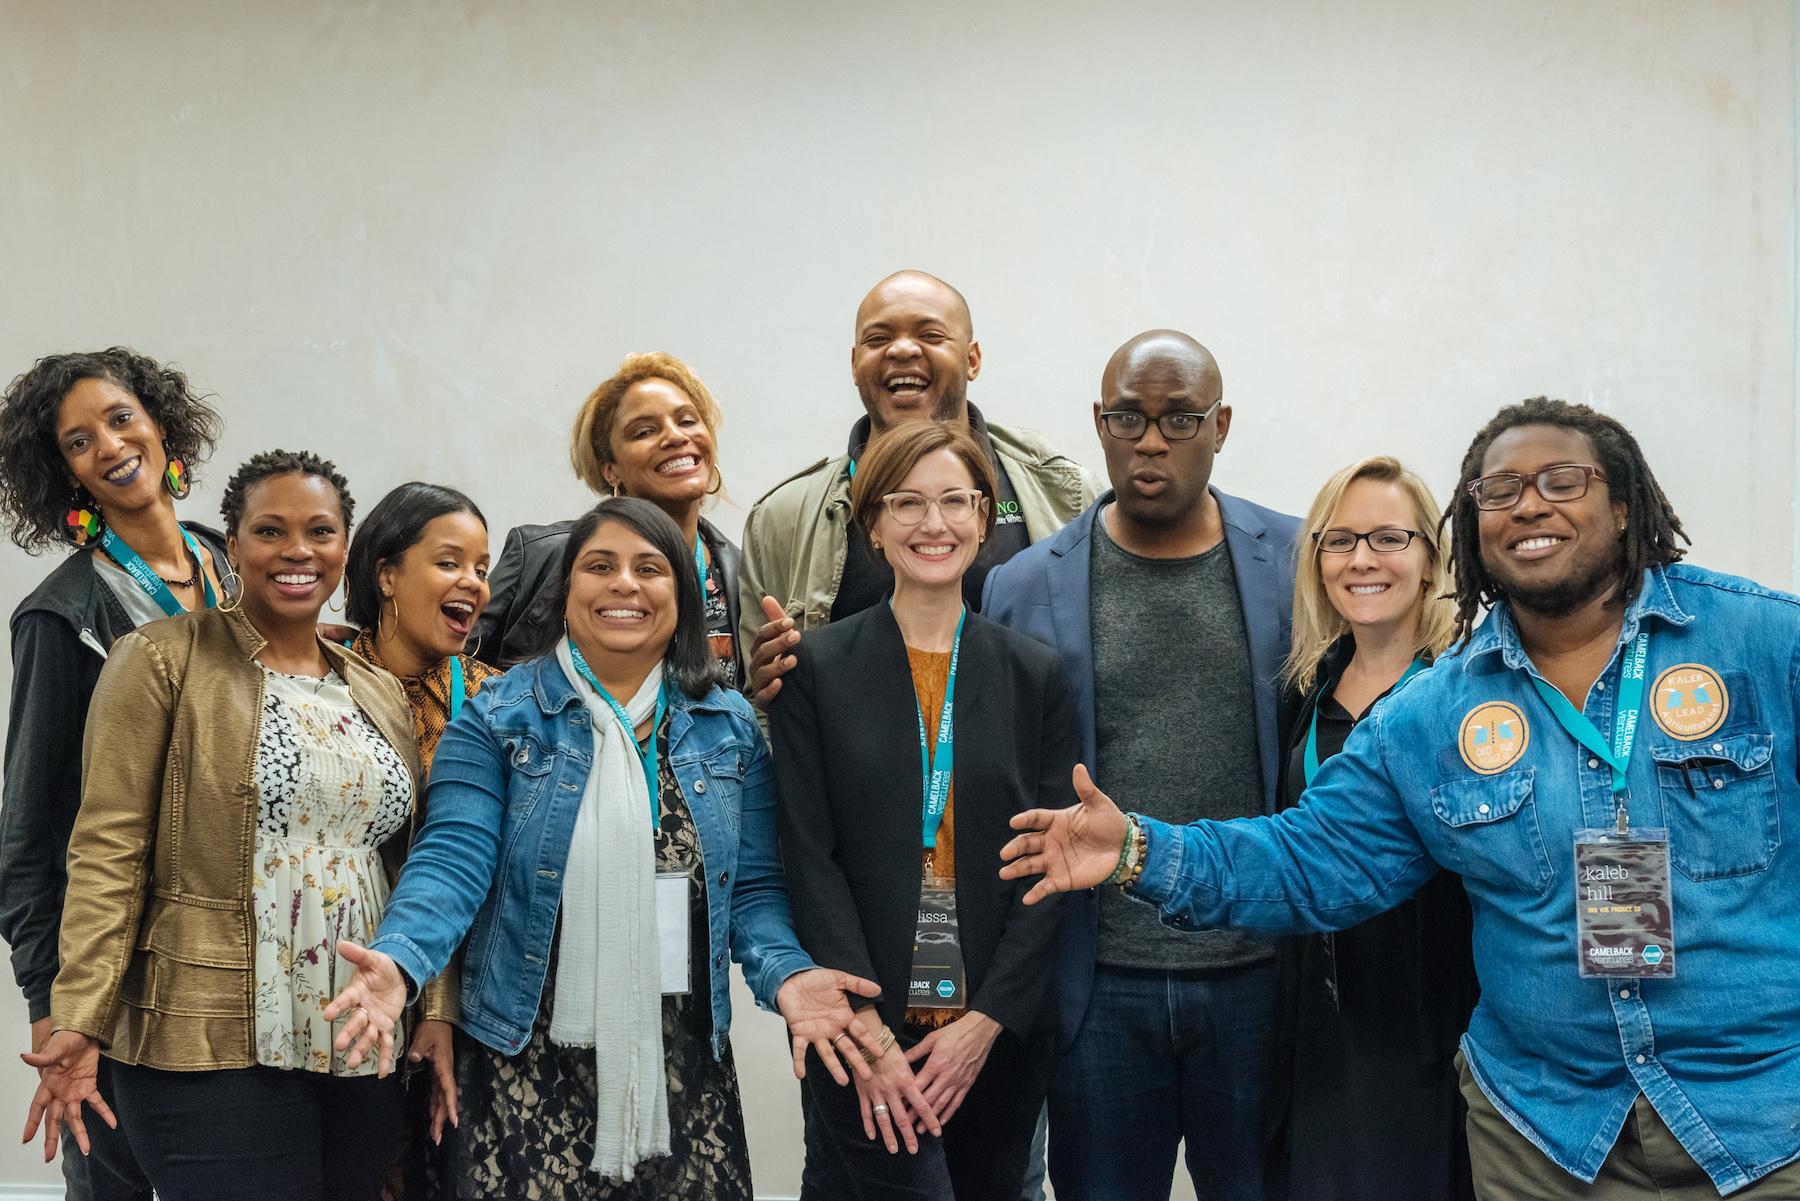 Gigsy; 2019-01-25; Camelback Ventures - Award Presentation; 155.jpg